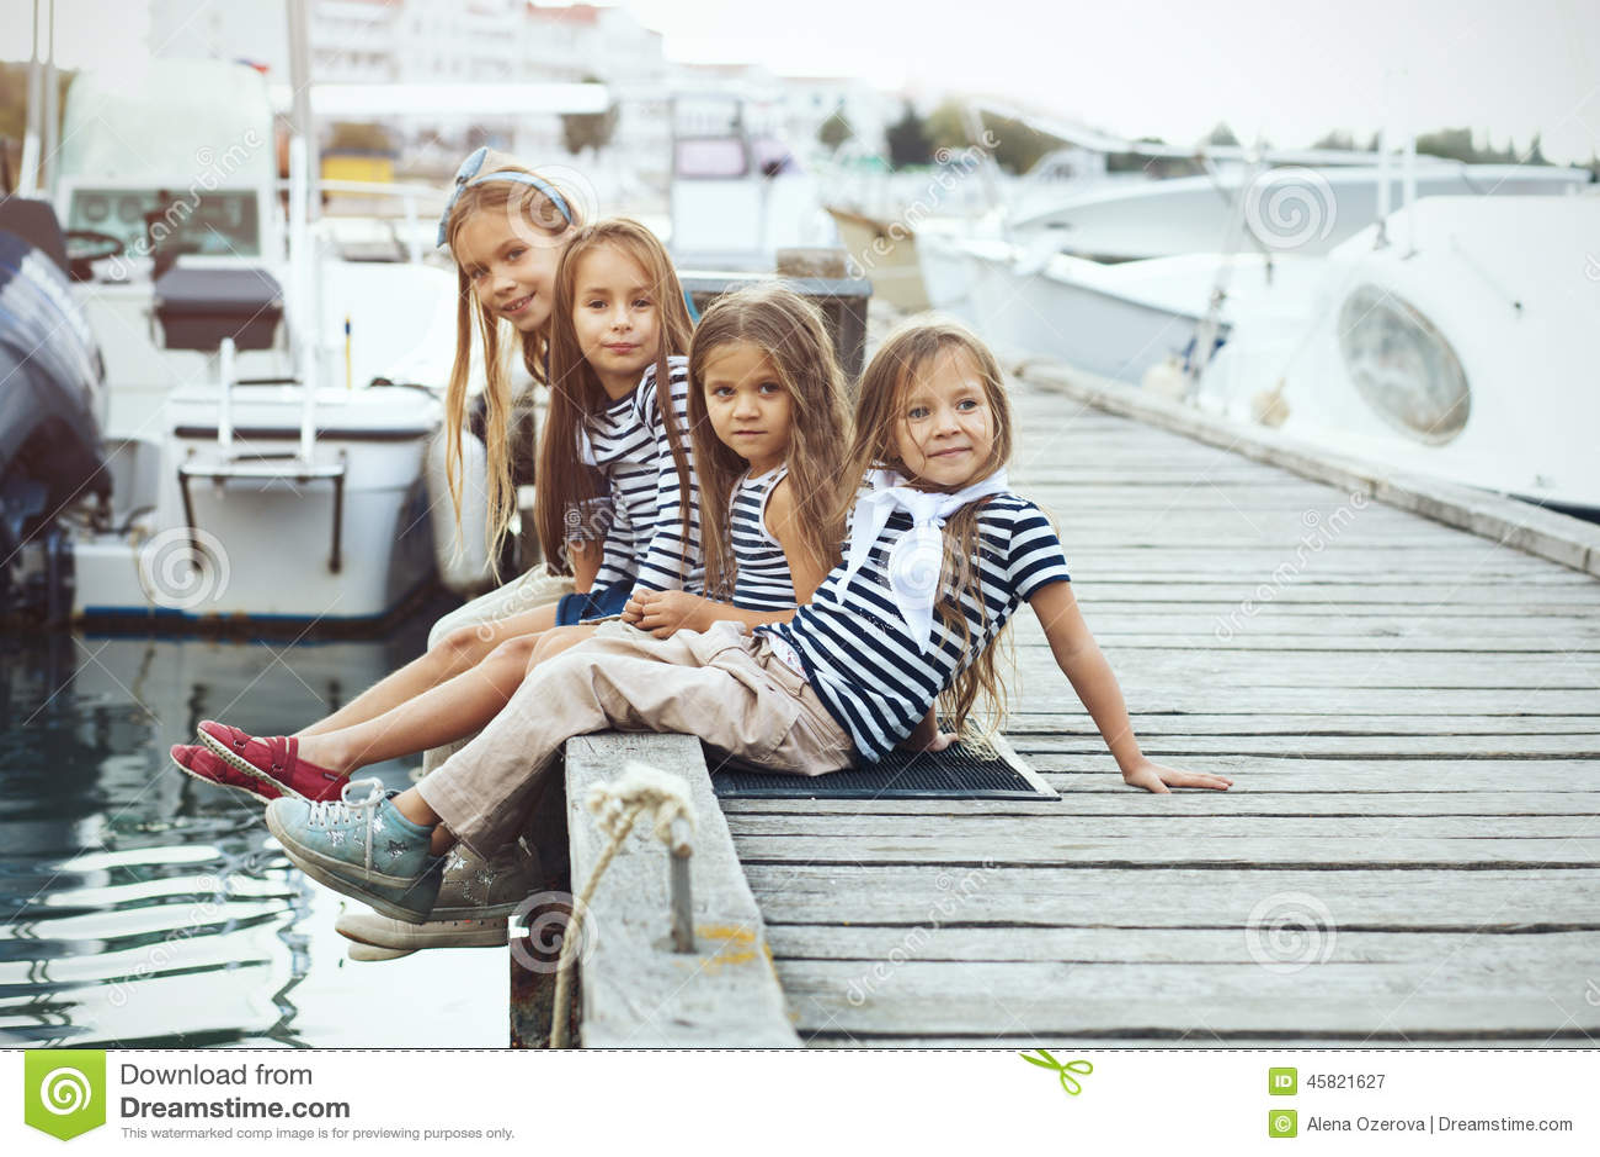 Fashion Kids Stock Photo Image 45821627